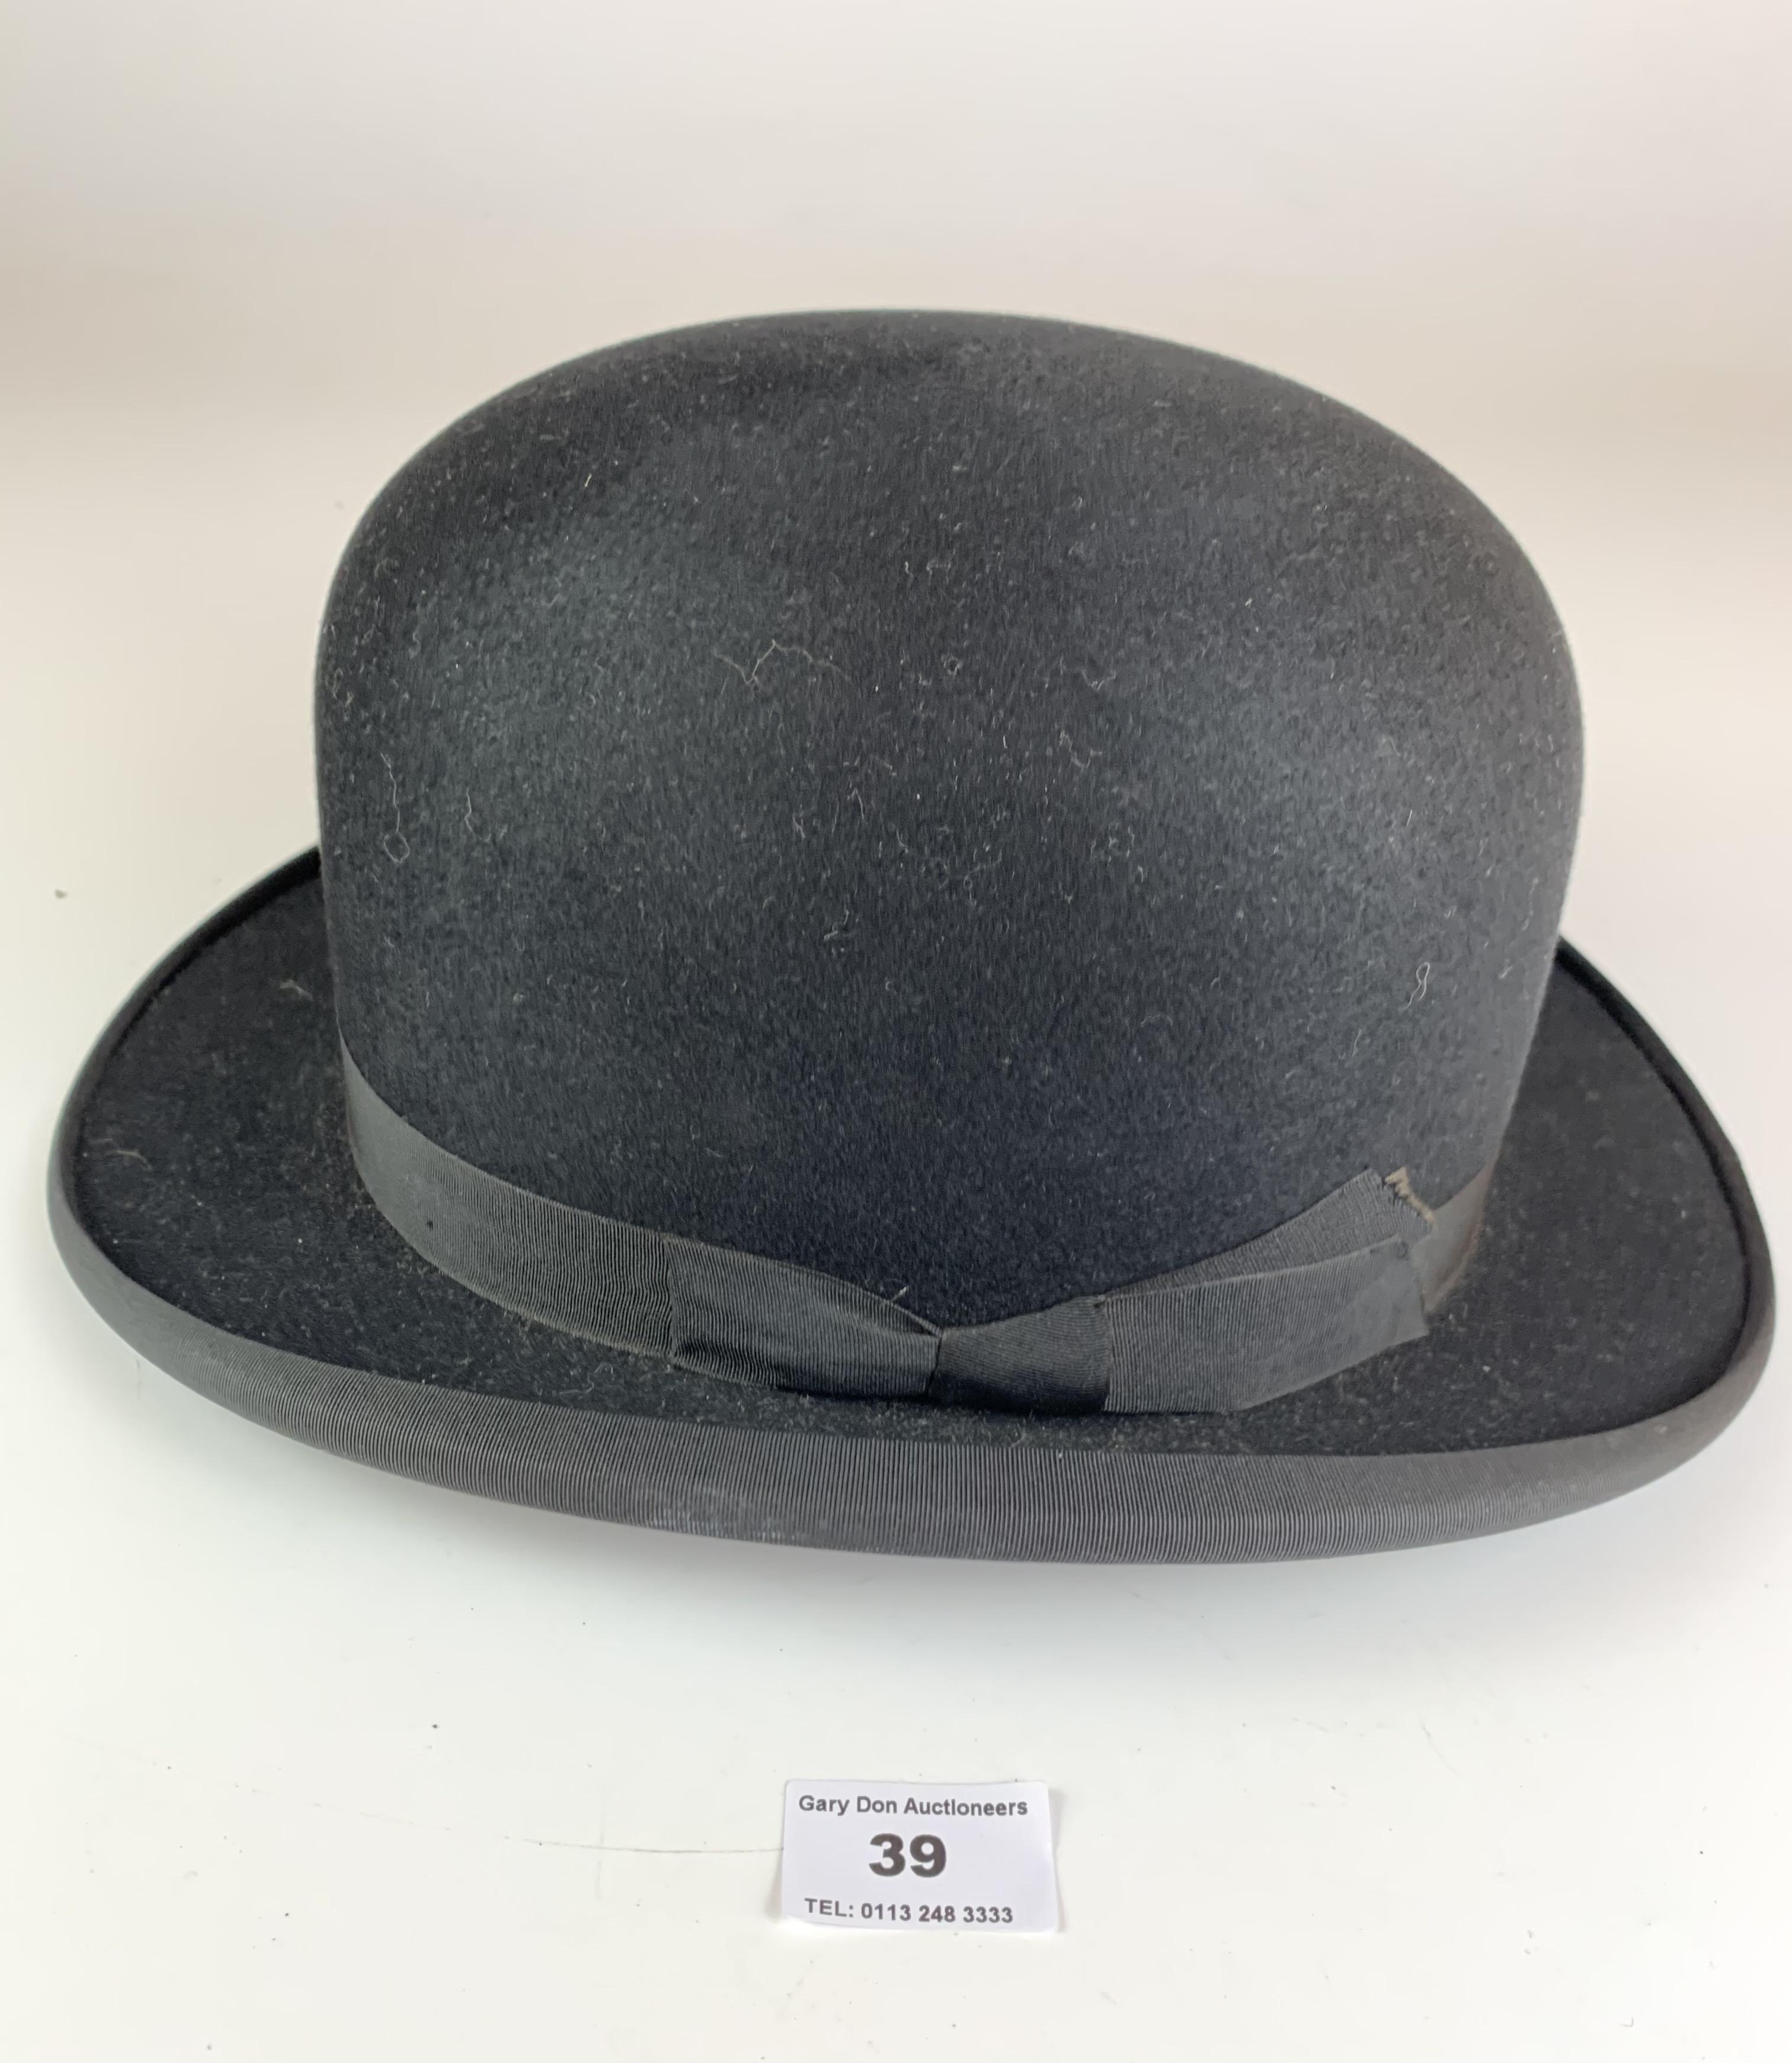 Bowler hat by John Craig, Hatter, Leeds - Image 4 of 6